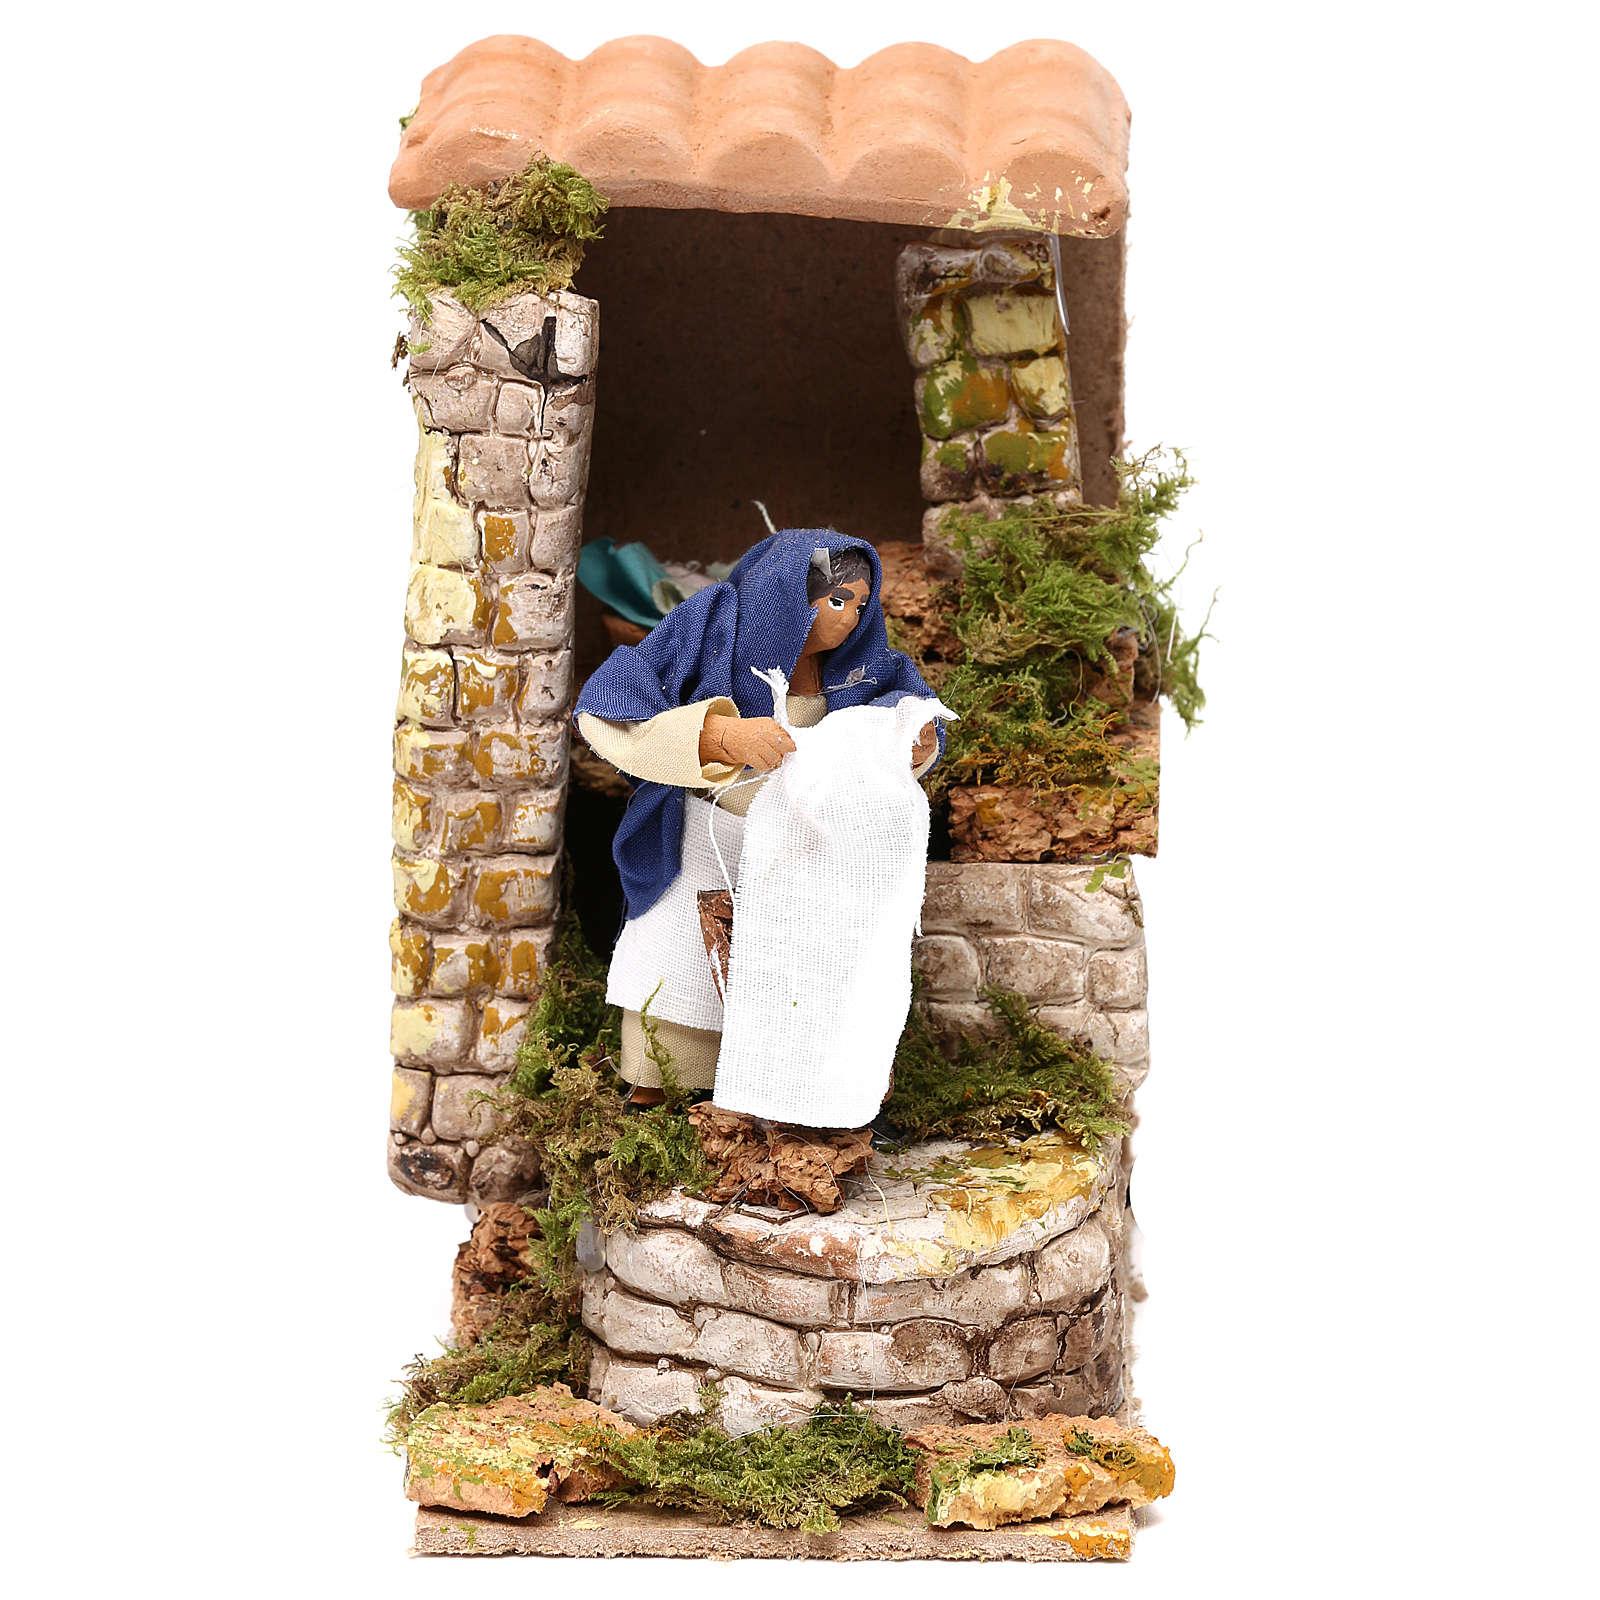 Animated nativity scene figurine, washerwoman 8cm 3